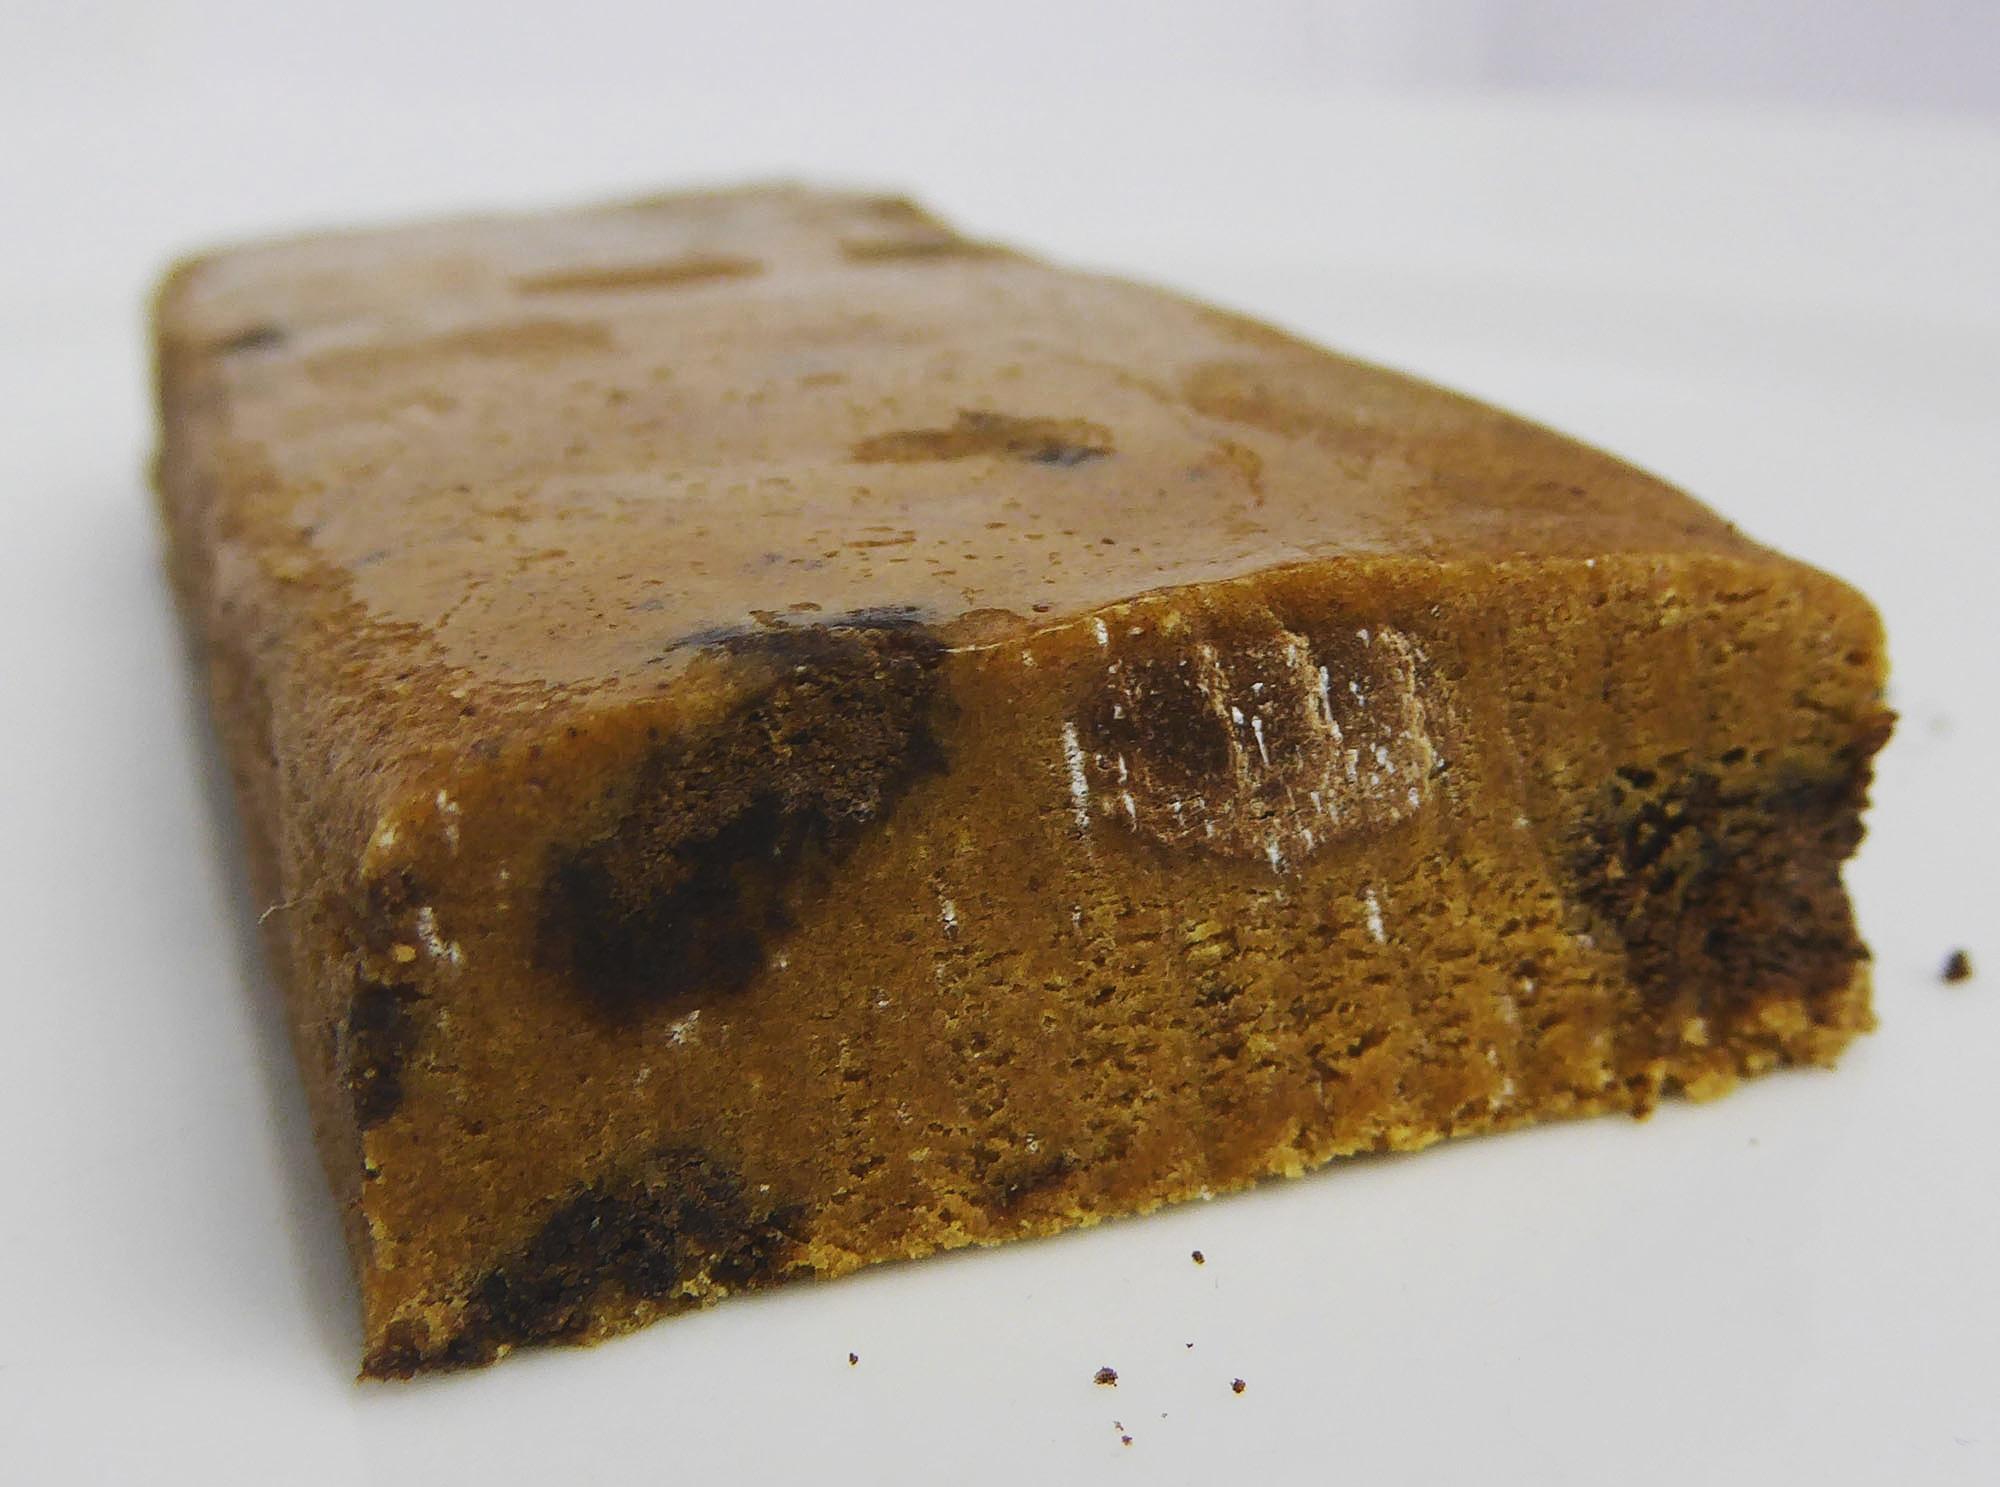 Questbar Mokka Schokolade Protein Bar Proteinriegel